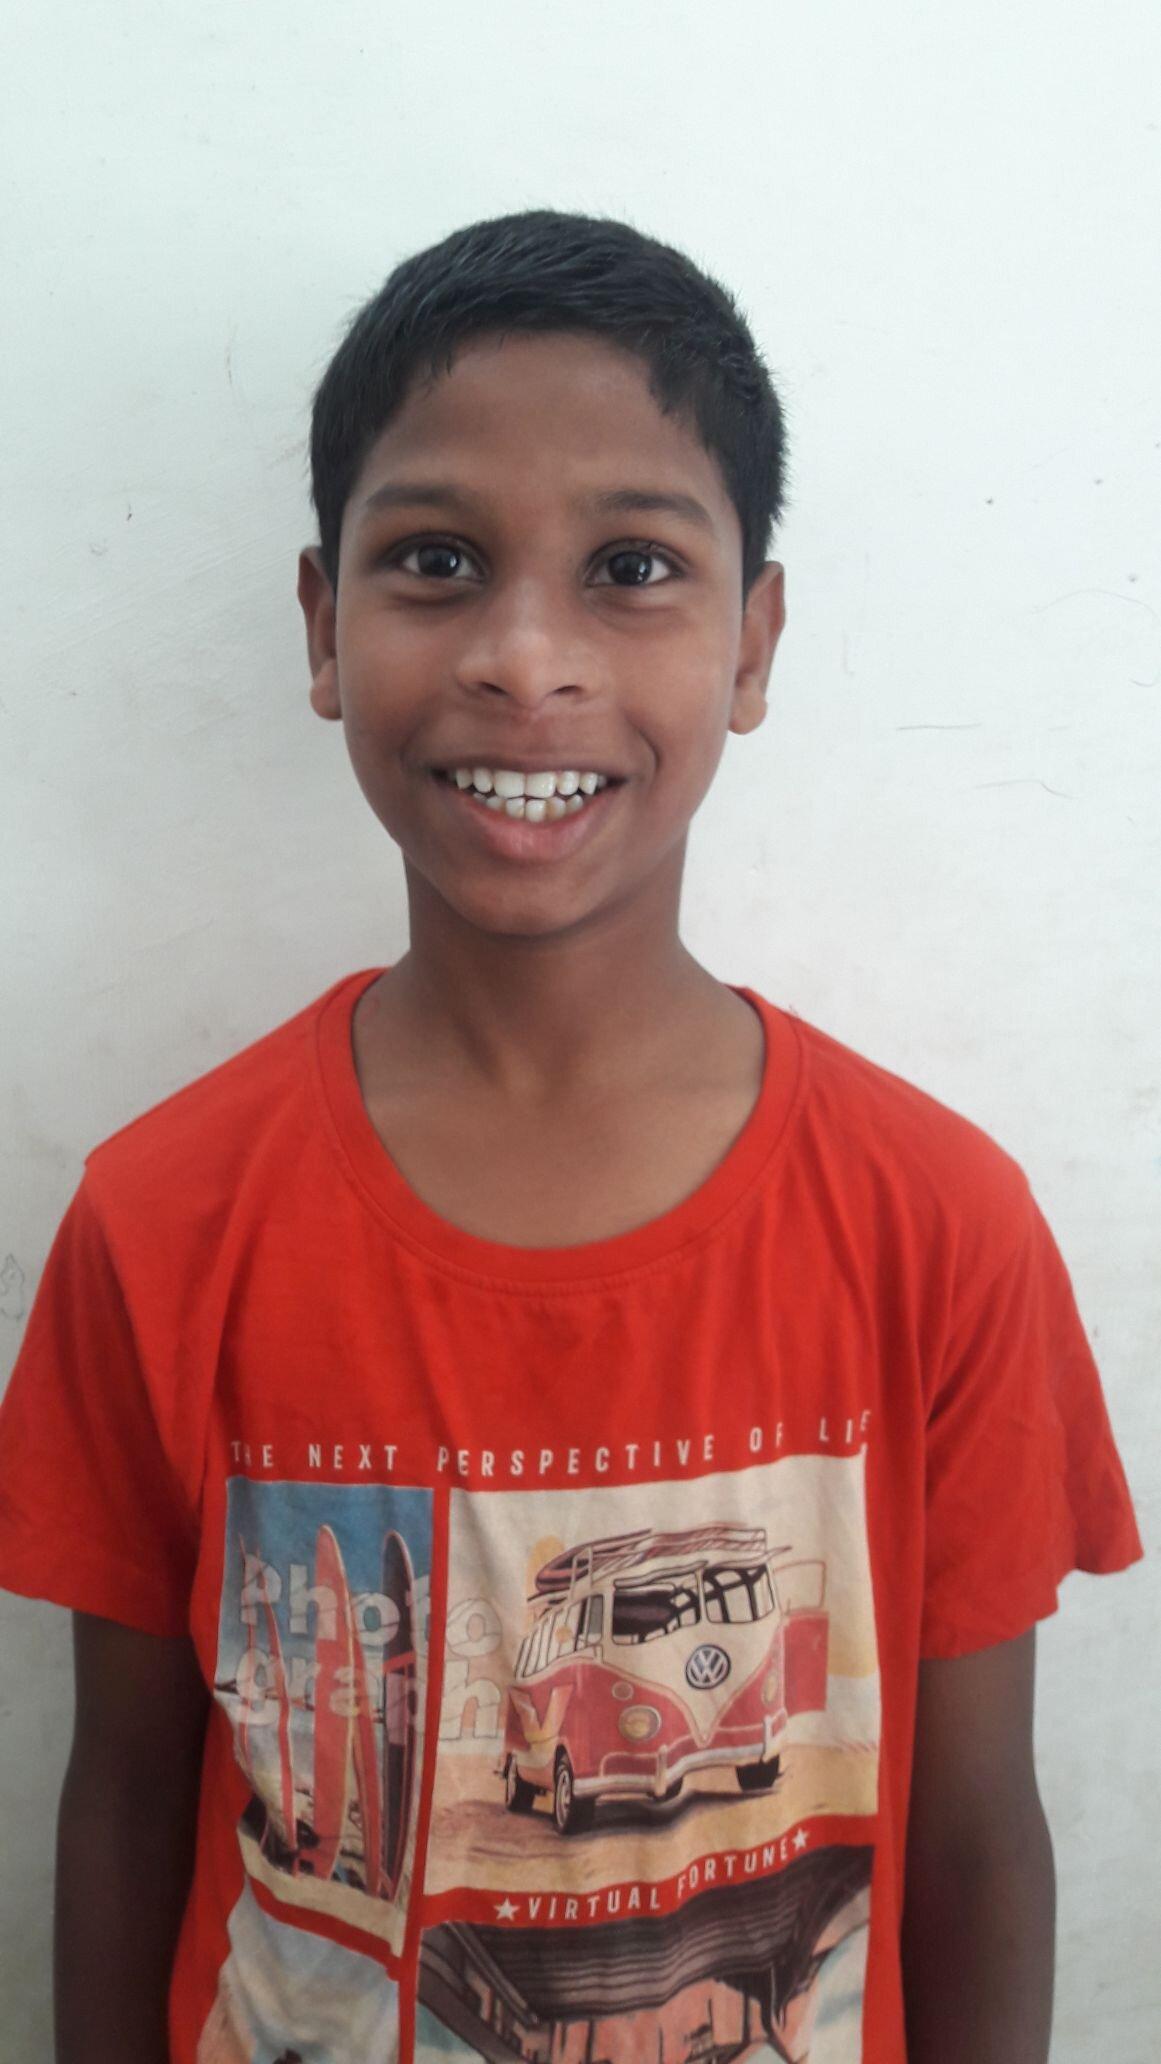 Moses Karmakar Kp6.jpg